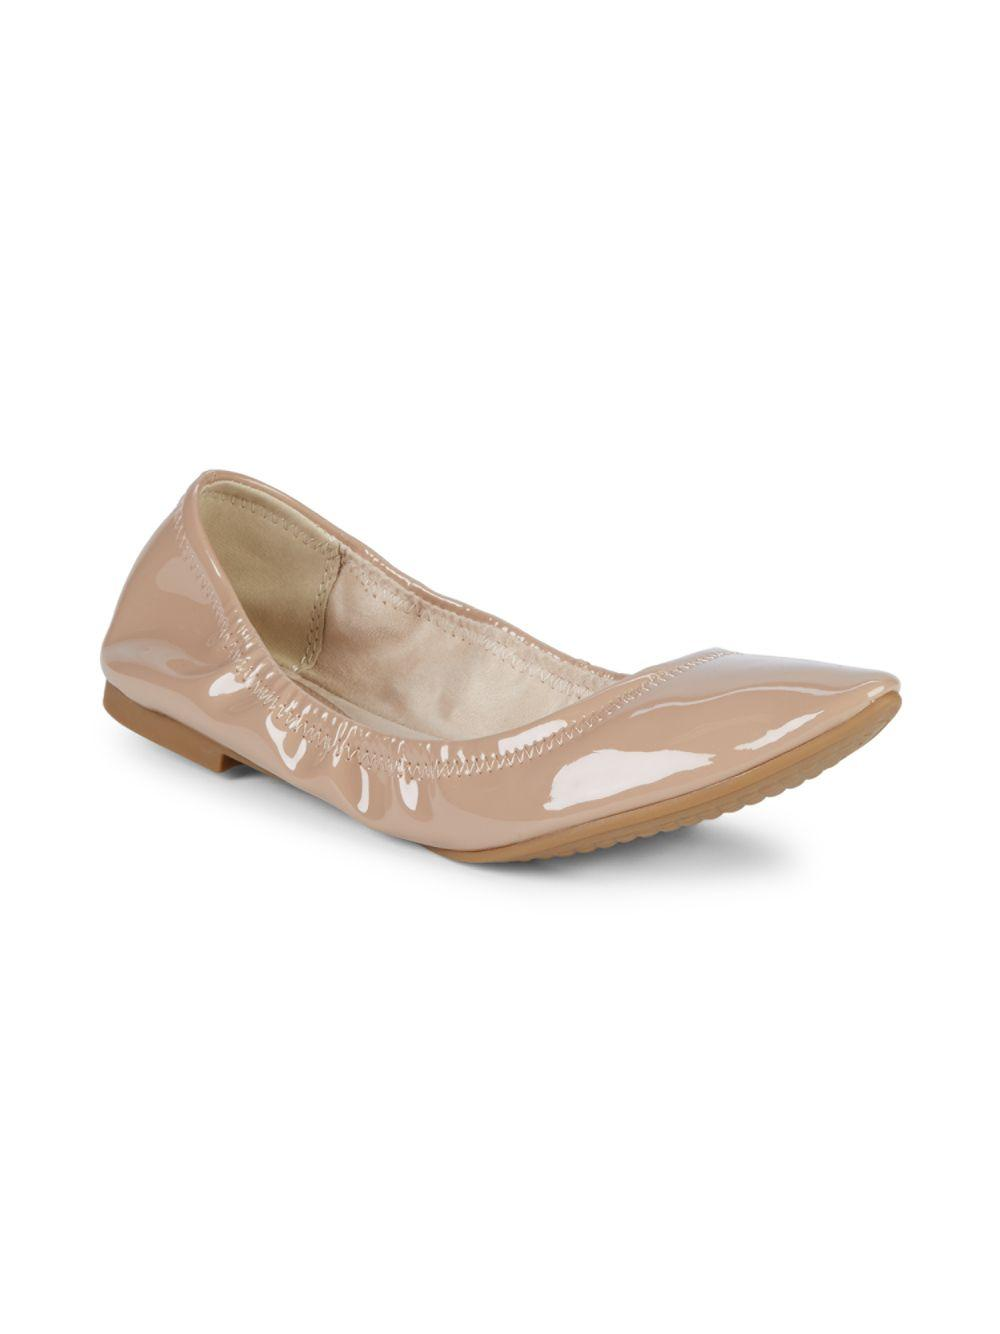 917473c7d13e20 BCBGeneration - Natural Classic Patent Leather Ballet Flats - Lyst. View  fullscreen